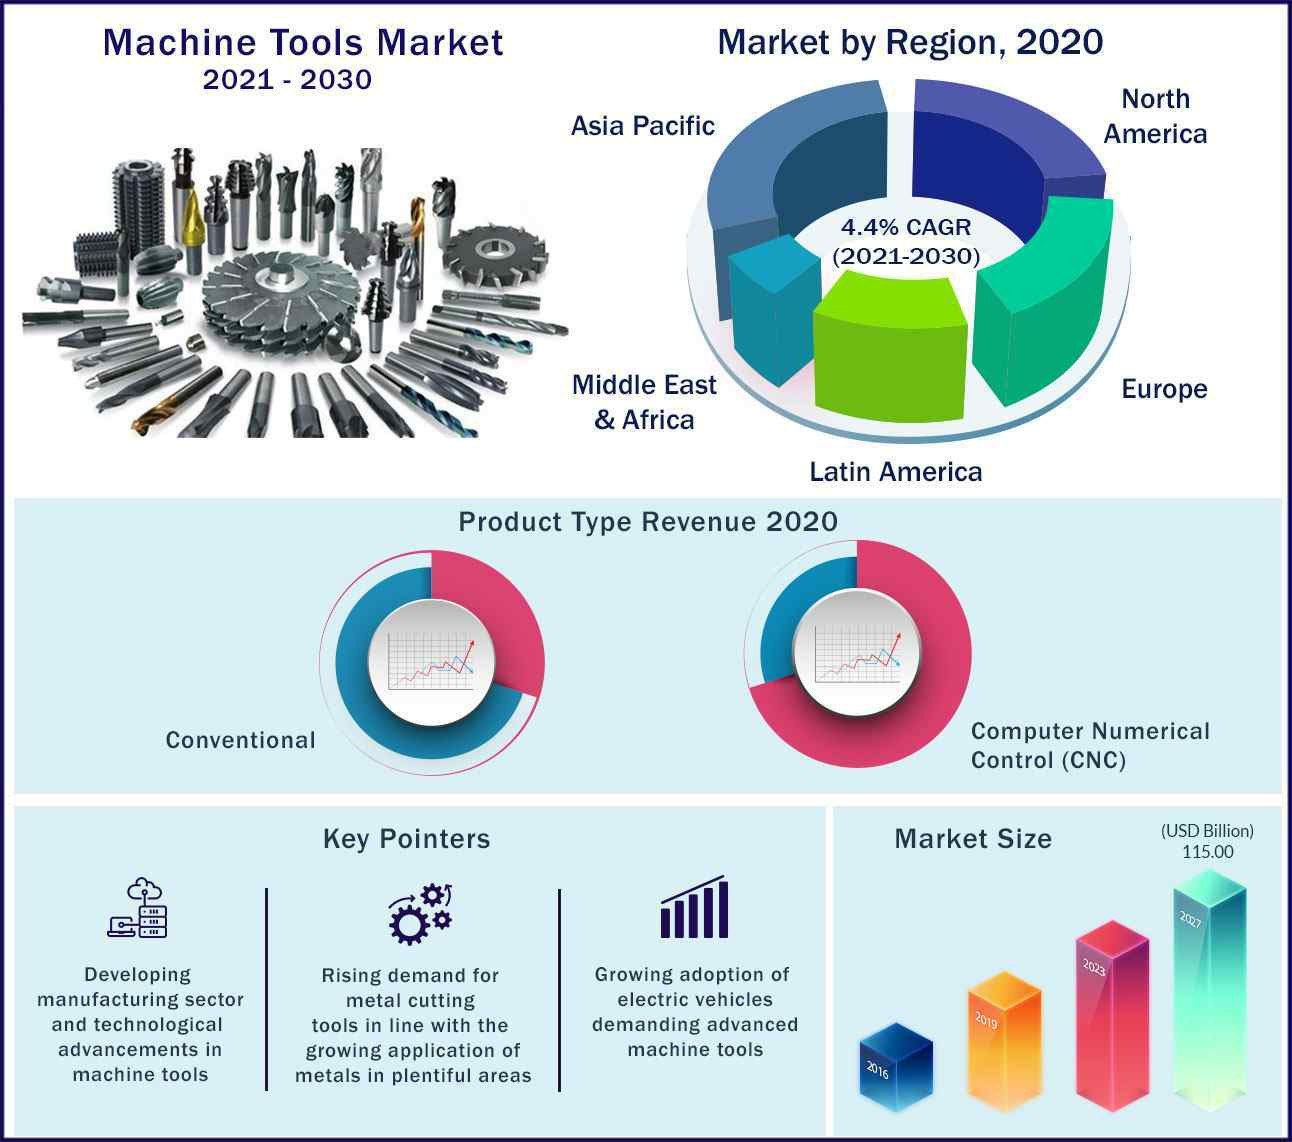 Global Machine Tools Market 2021-2030